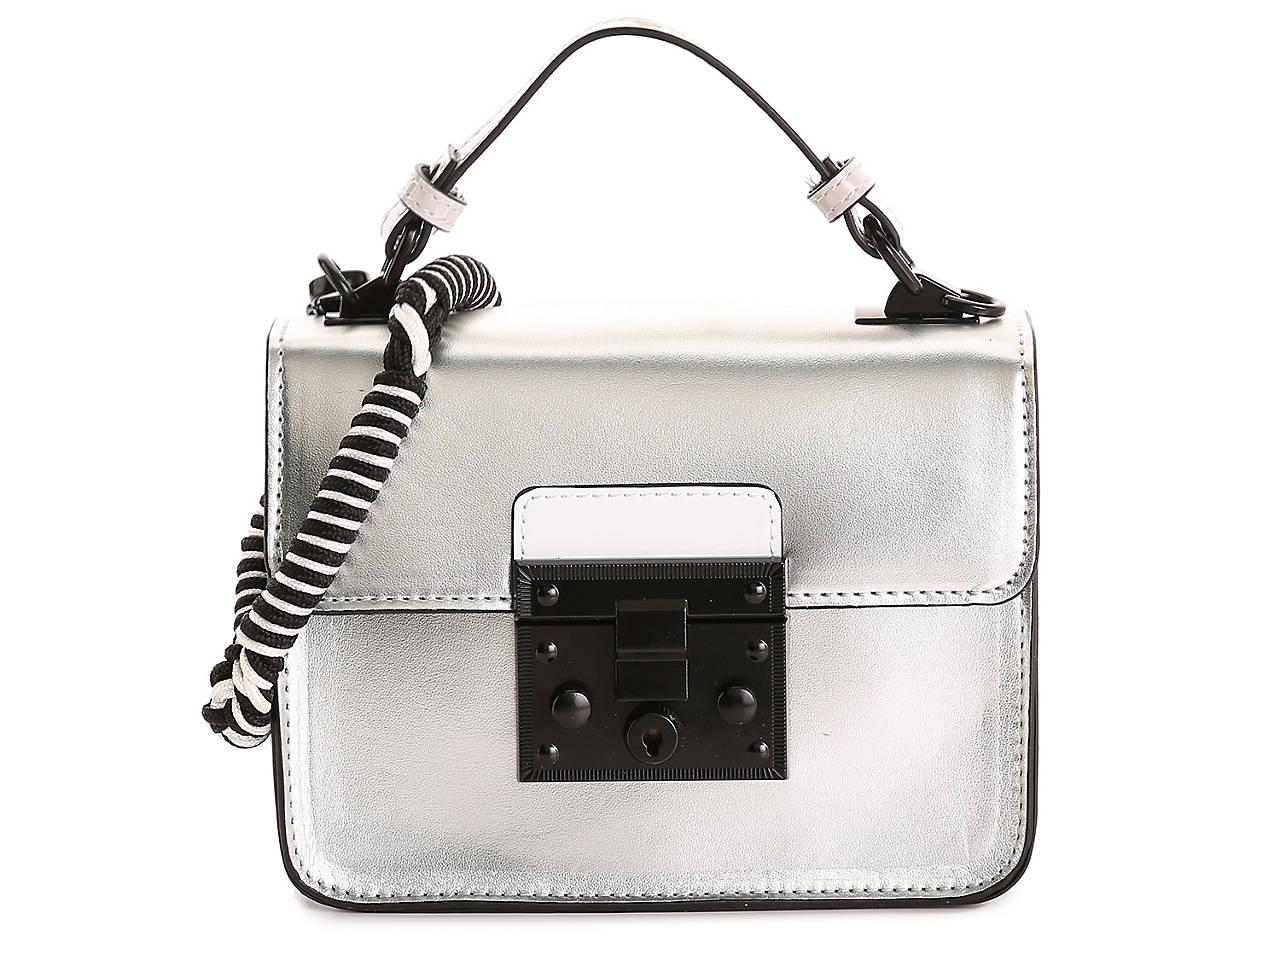 227a8738f8f Beffie Crossbody Bag